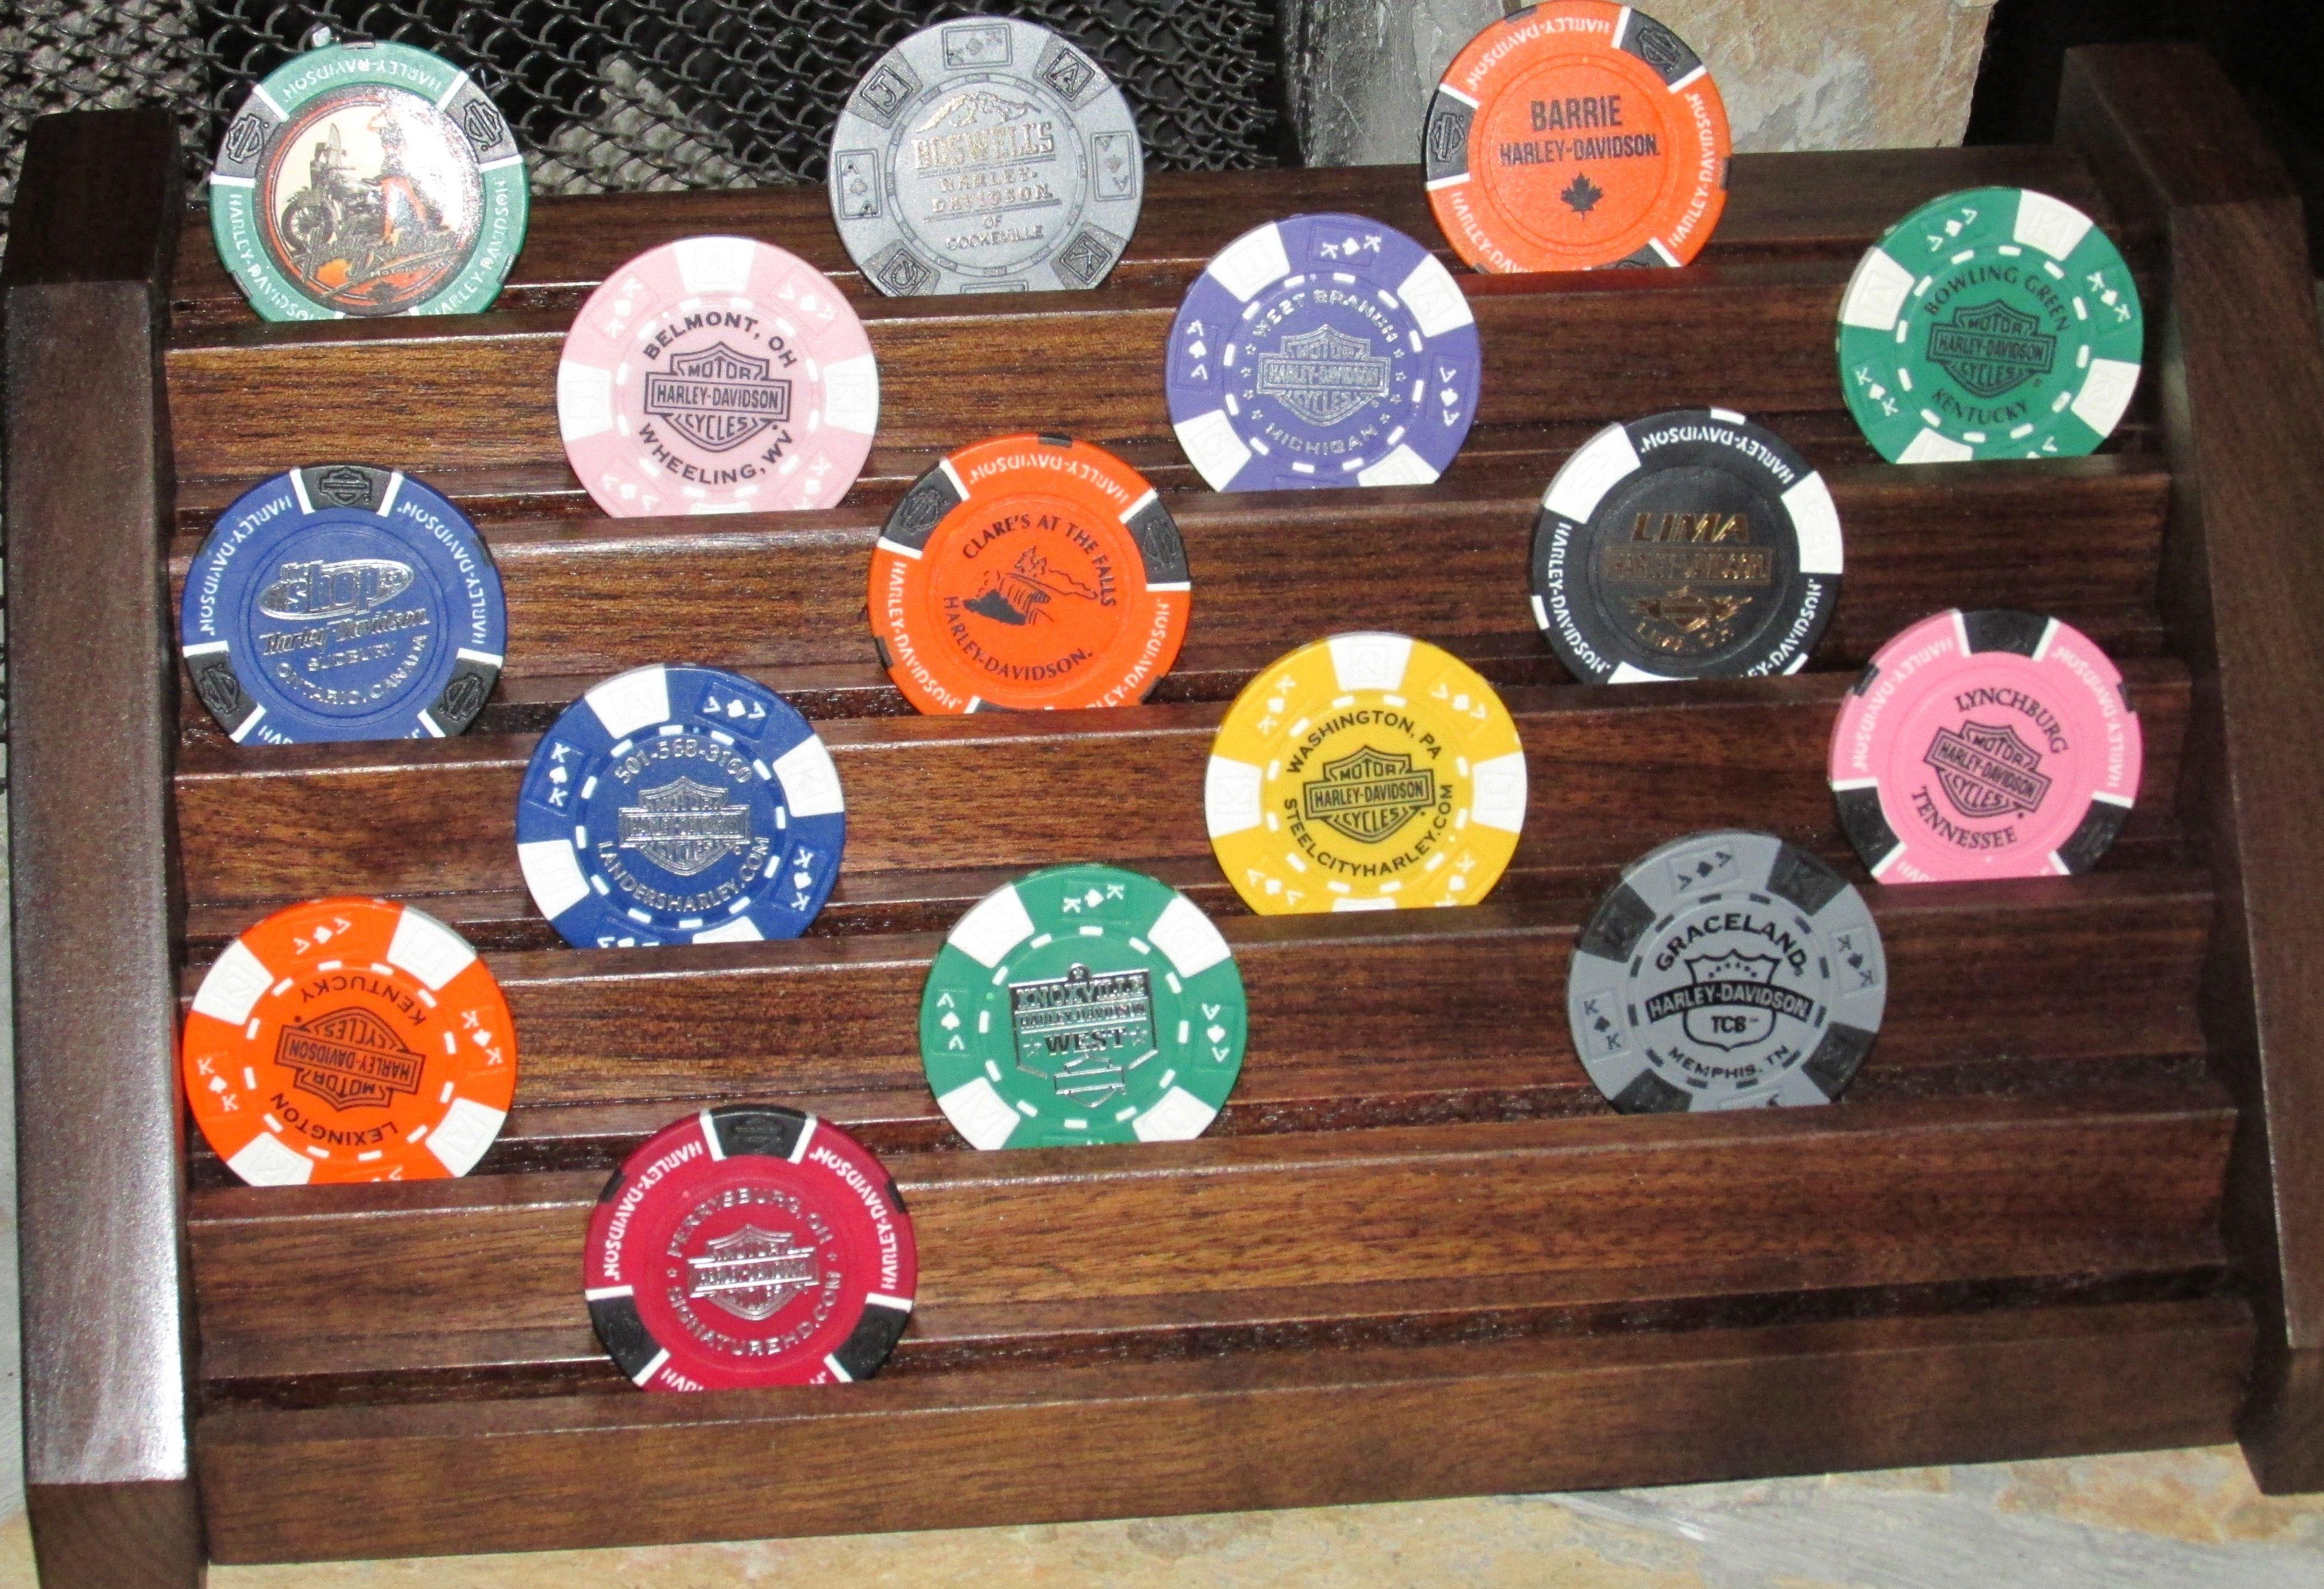 Harley Davidson Poker Chips Display Harley Davidson